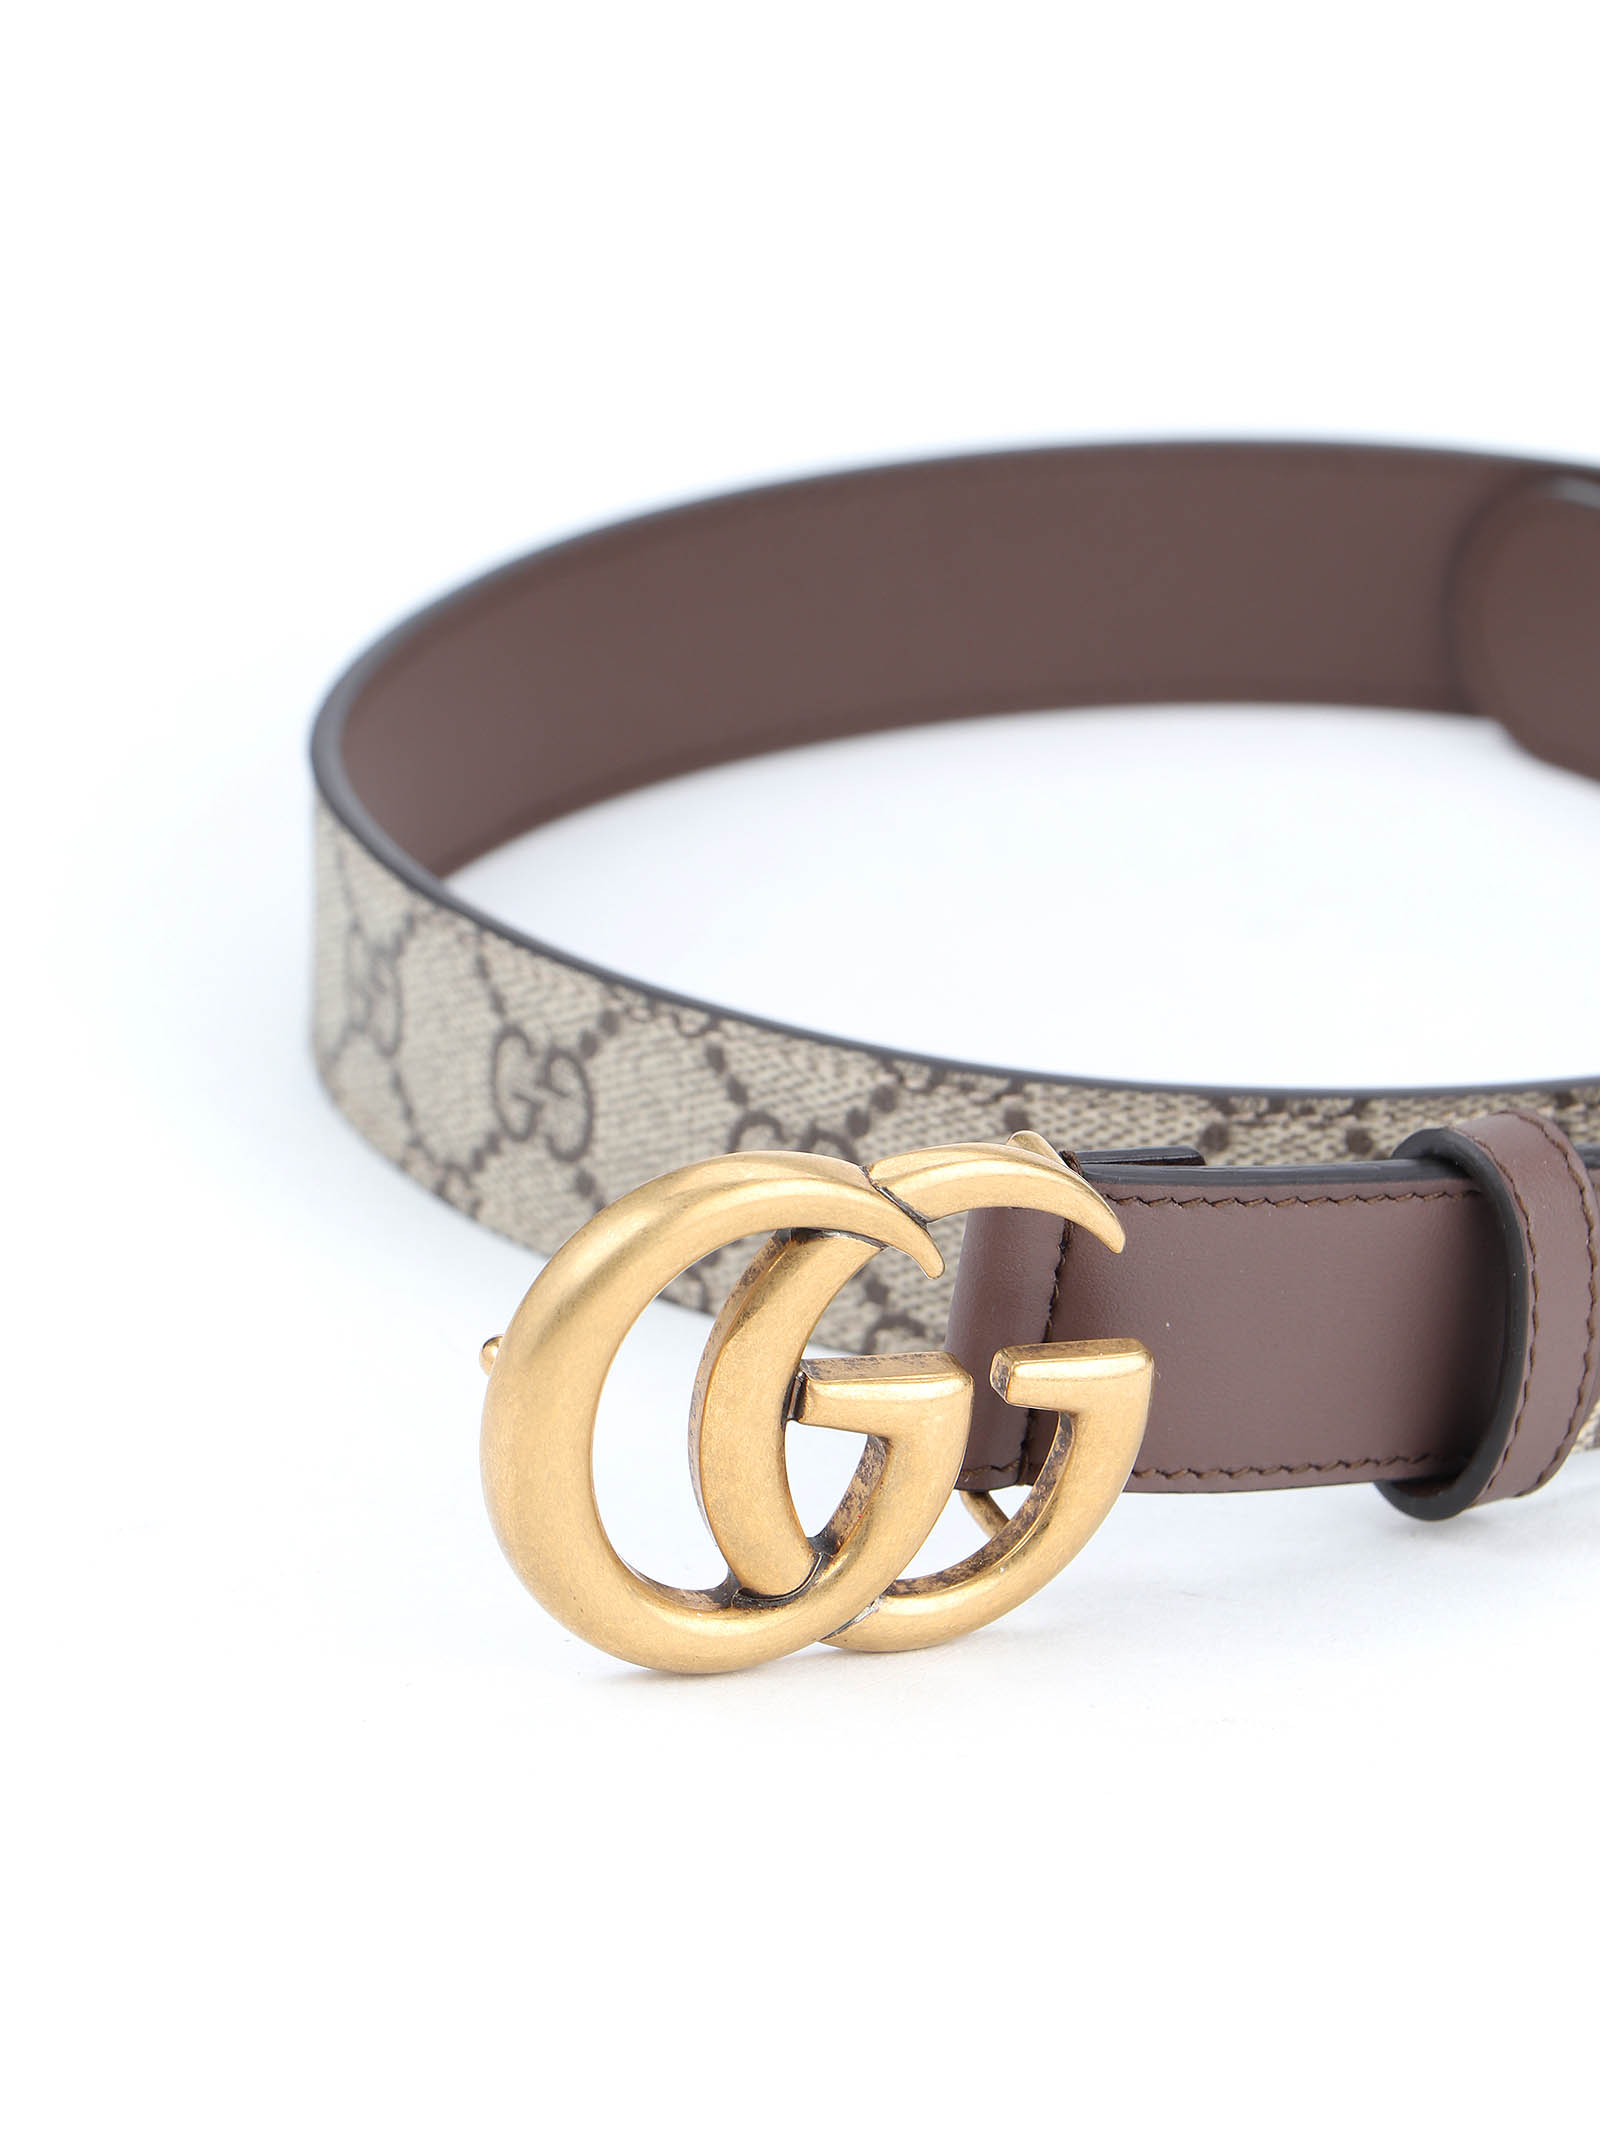 Immagine di Gucci | GG Marmont Belt W.30